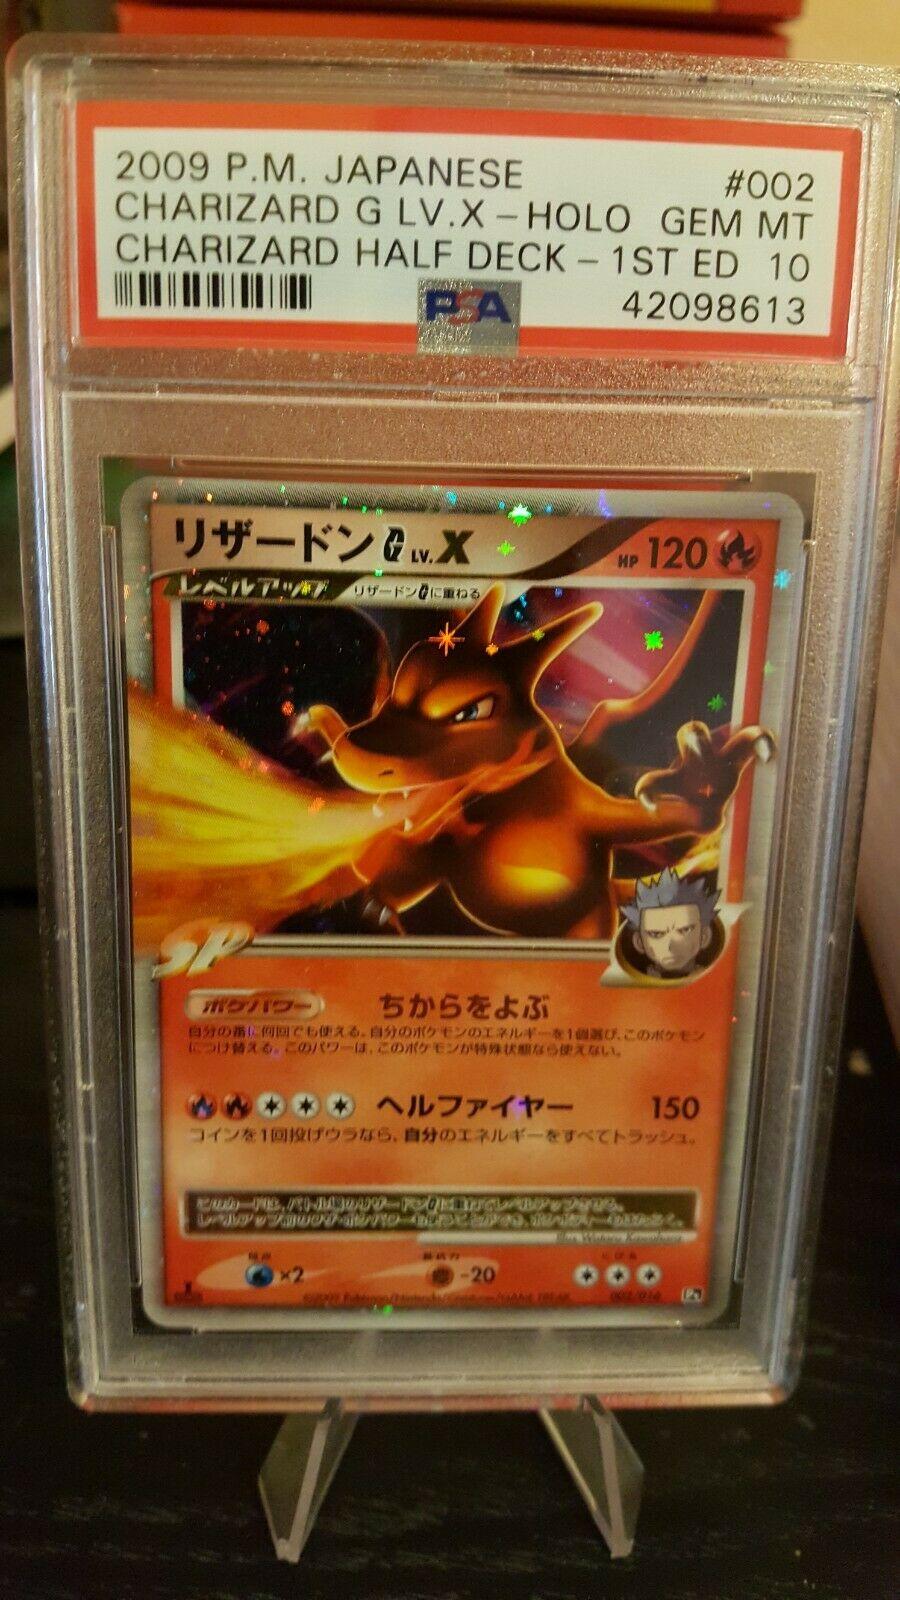 Pokemon card Japanese 1st ed Charizard G lvx Holo 002016 PSA 10 Gem Mint